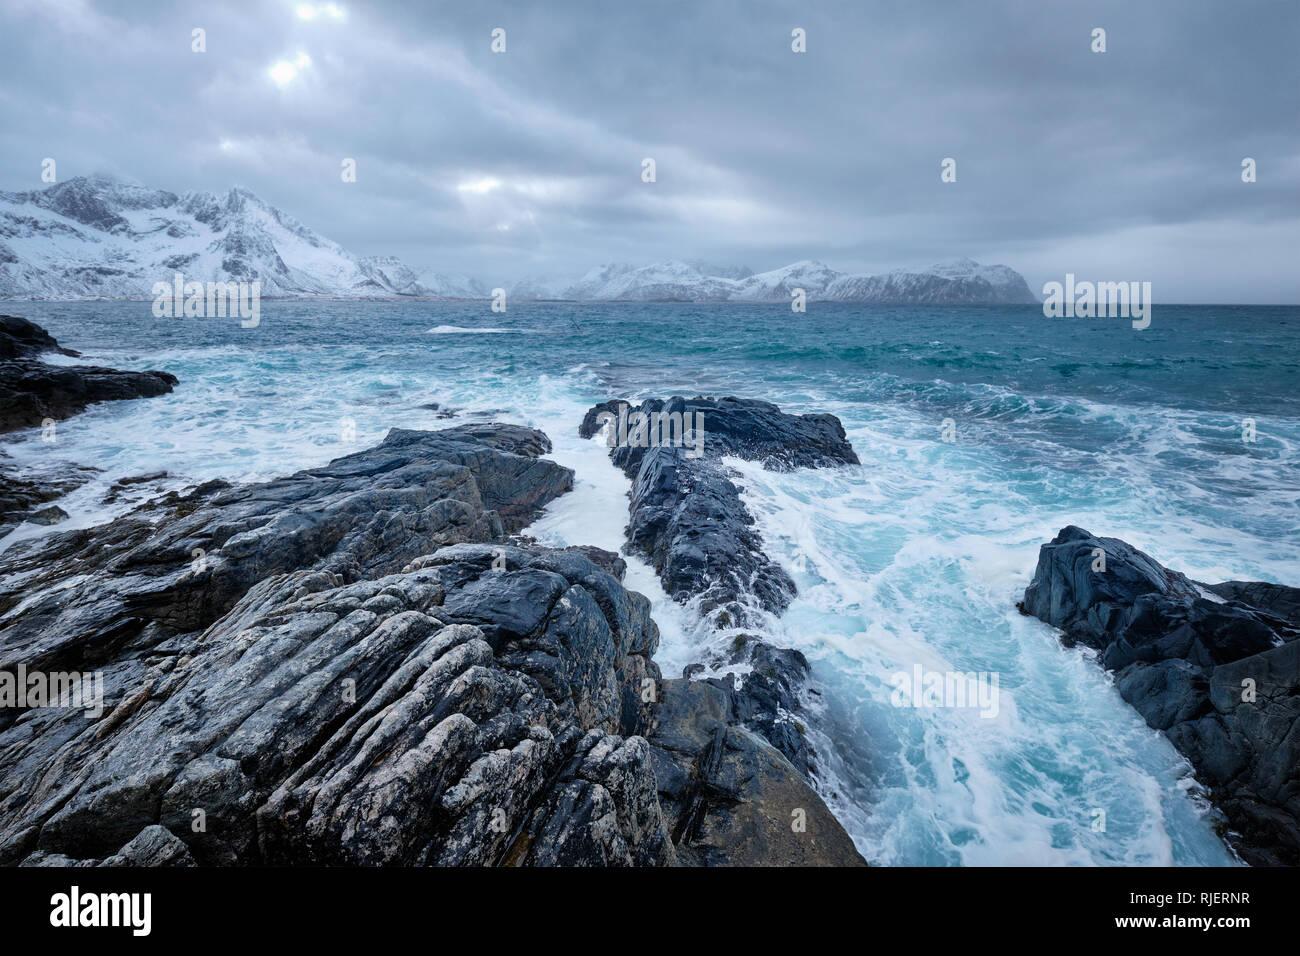 Norwegian Sea waves on rocky coast of Lofoten islands, Norway Stock Photo